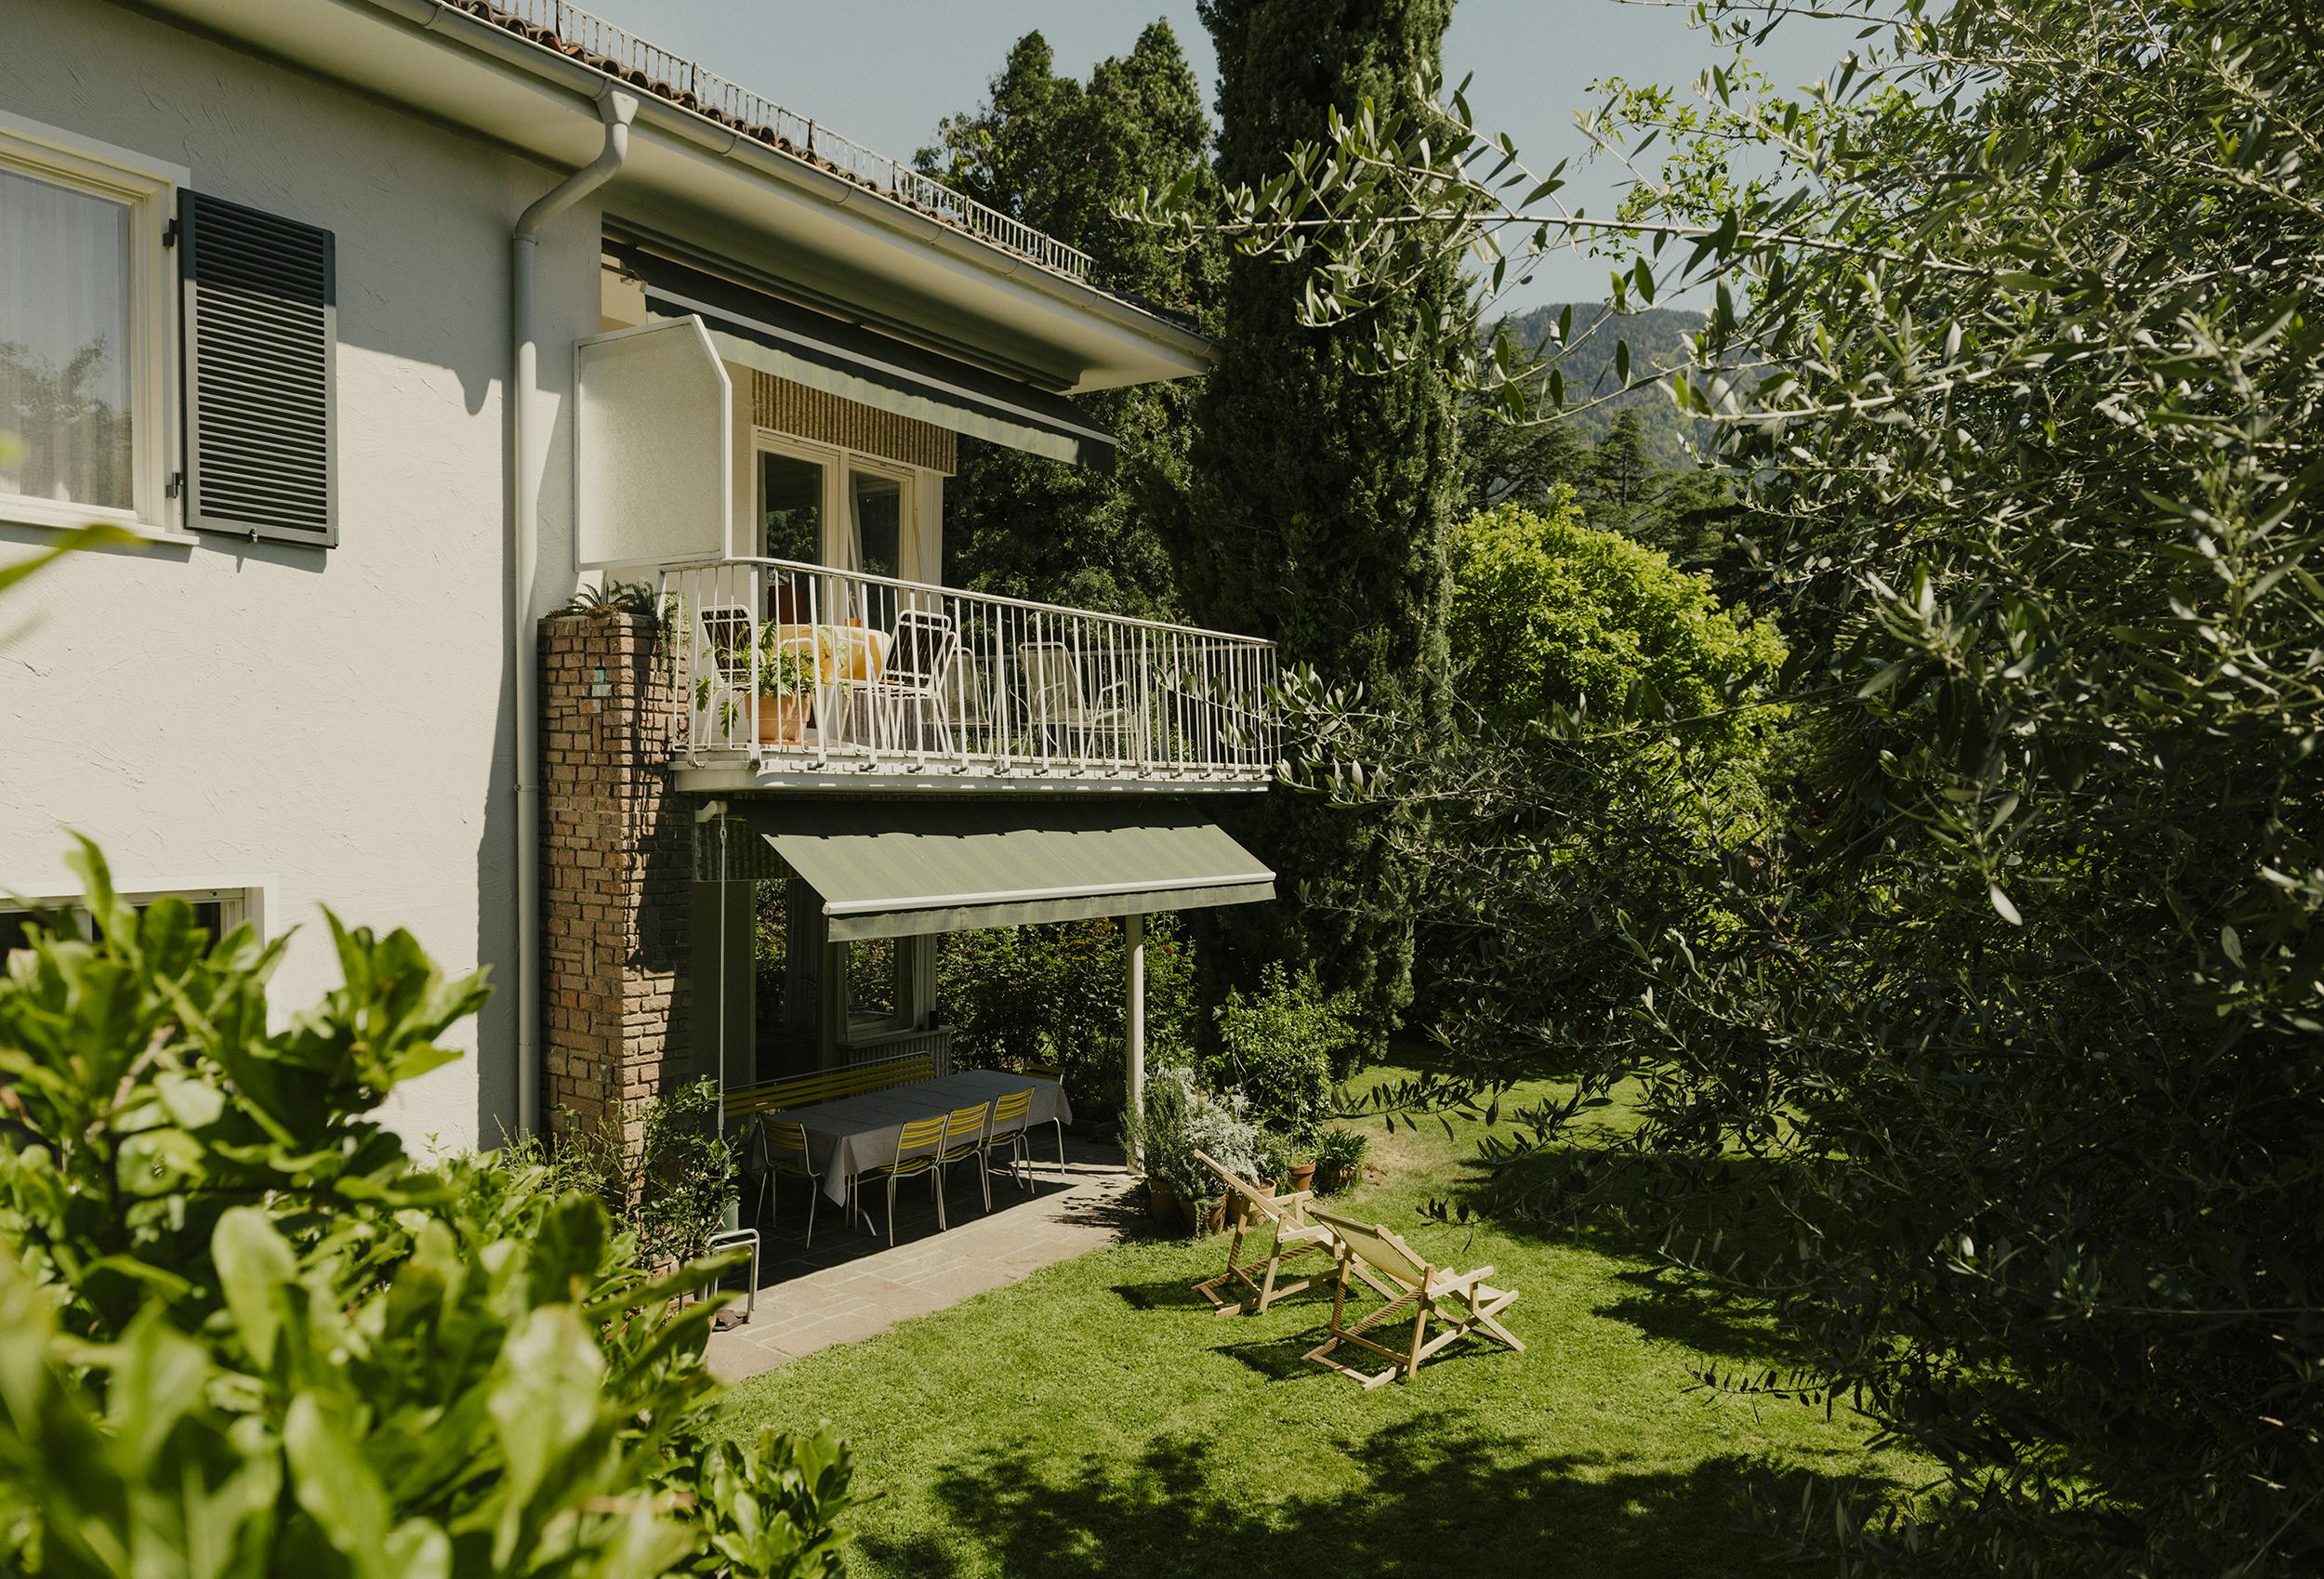 Villa Fluggi 179 (Urlaub im Denkmal)